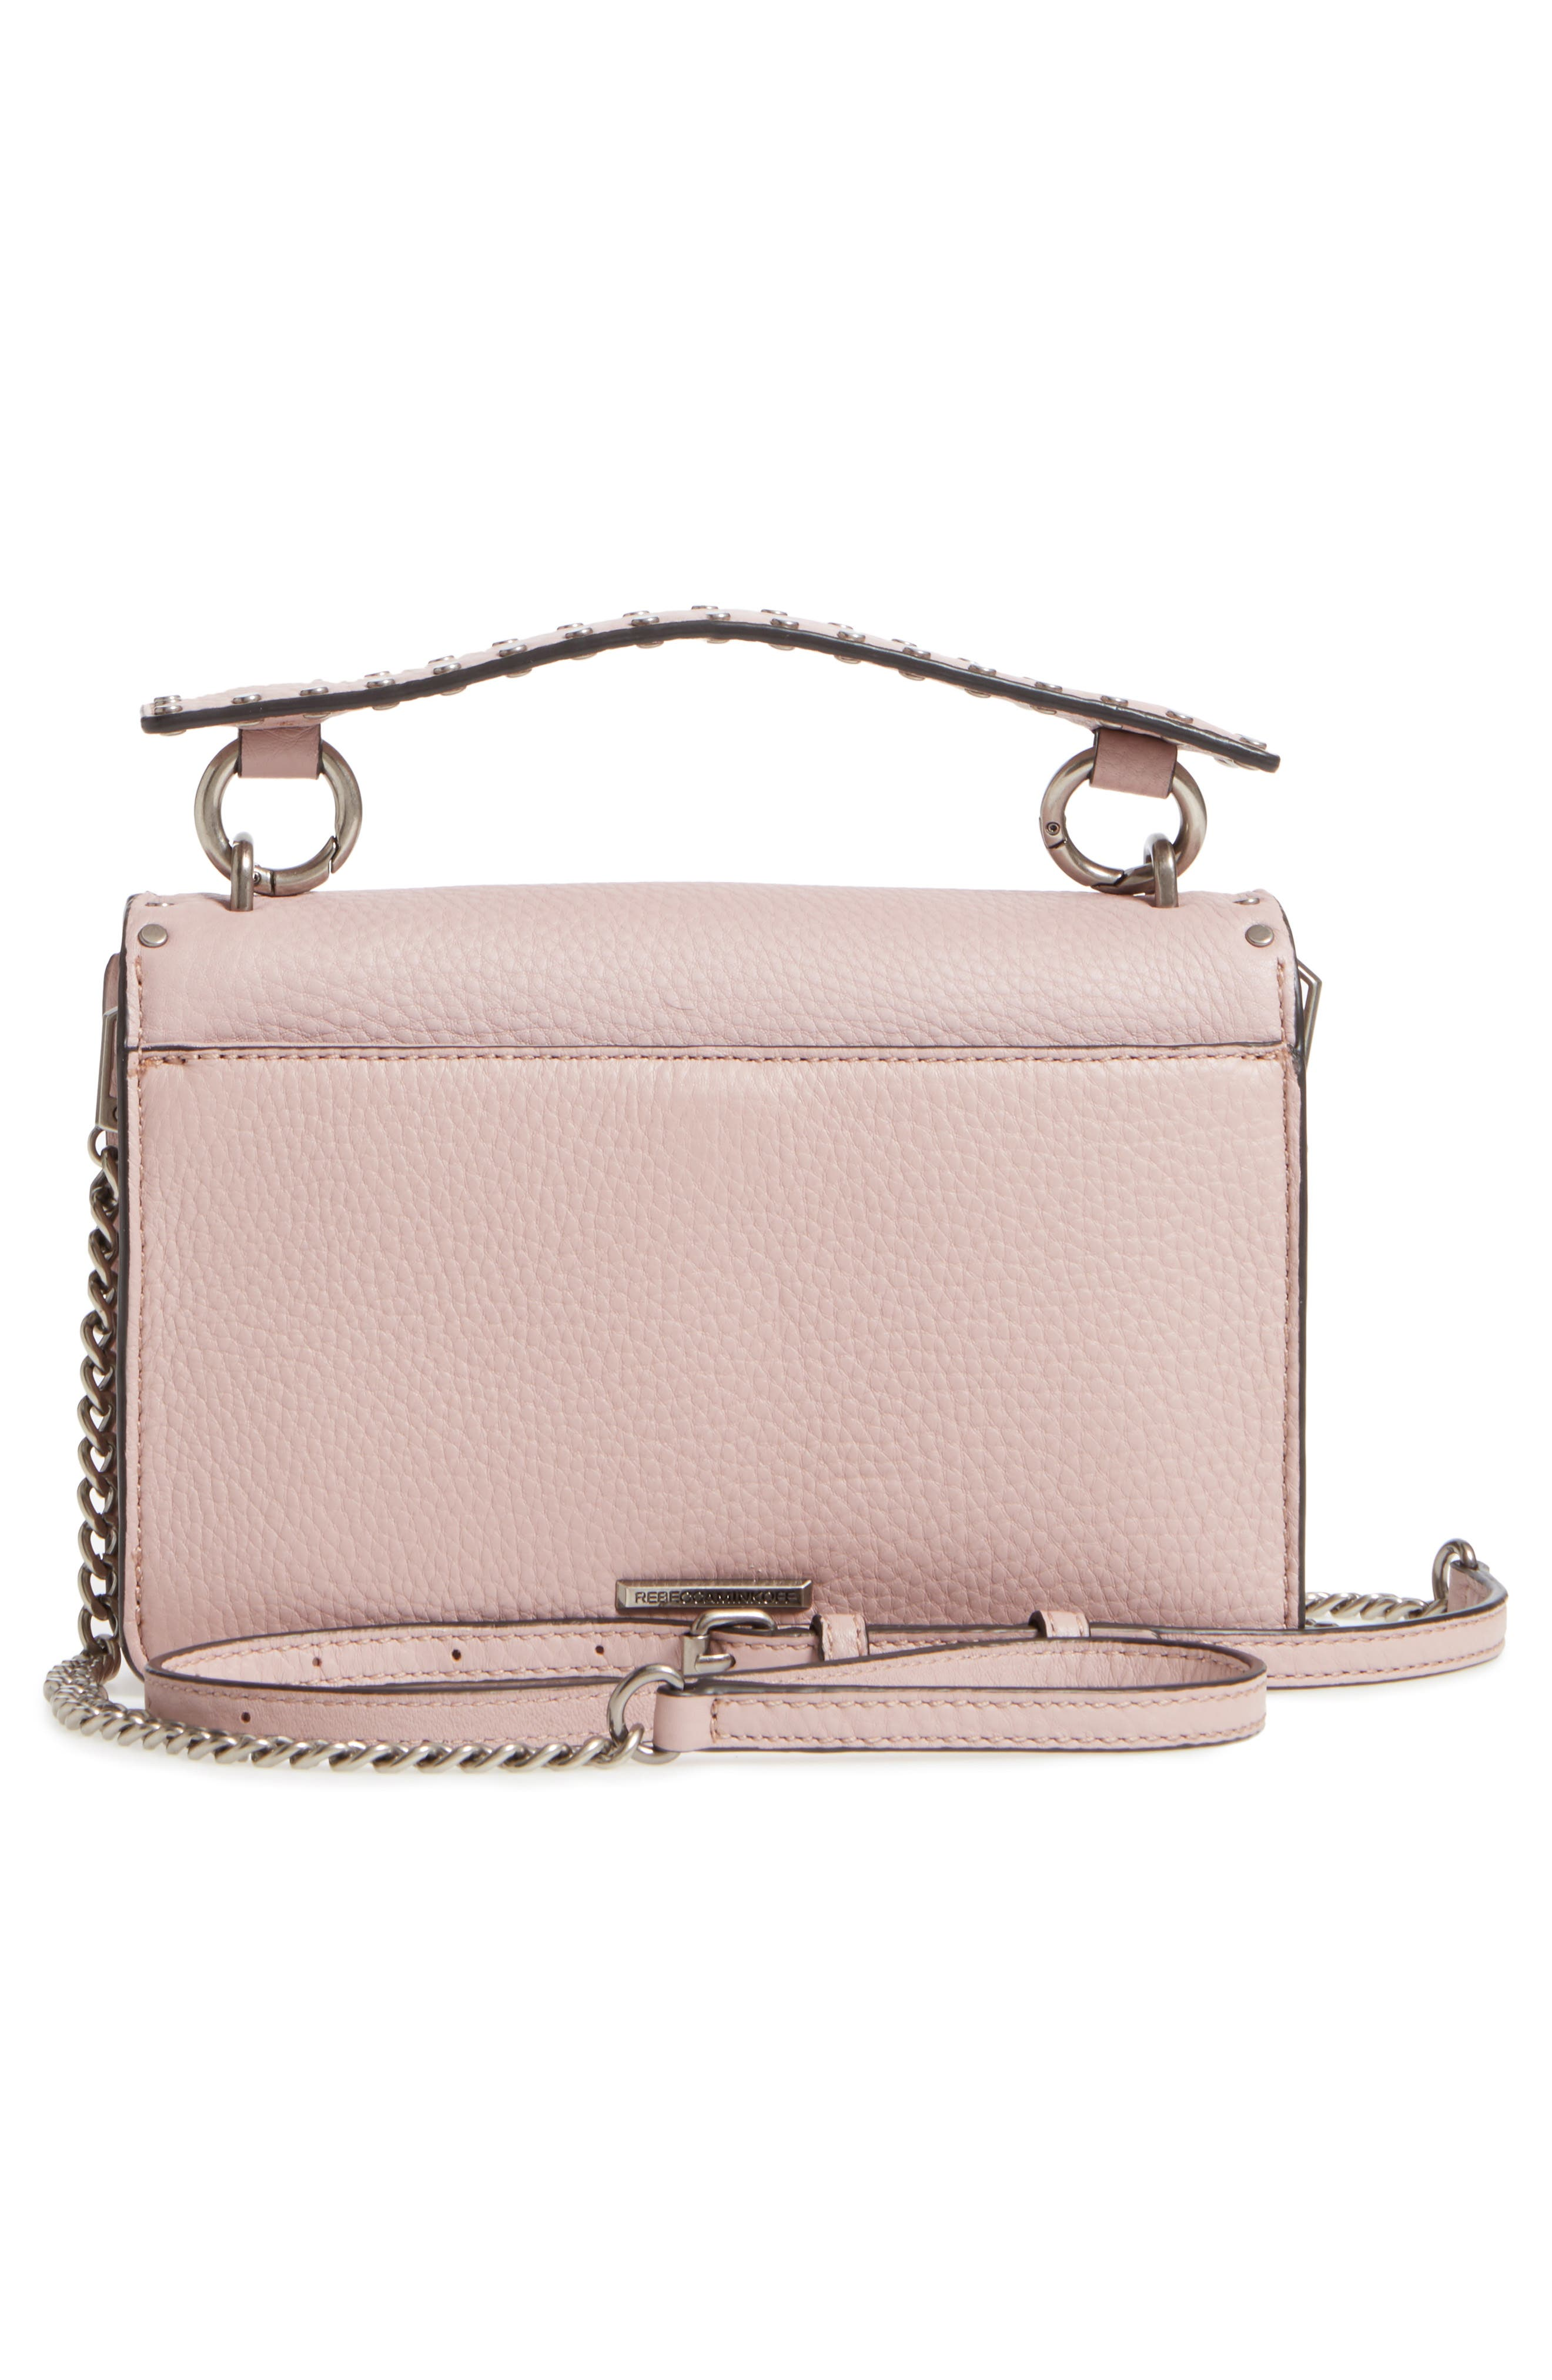 Darren Top Handle Crossbody Bag,                             Alternate thumbnail 2, color,                             Vintage Pink